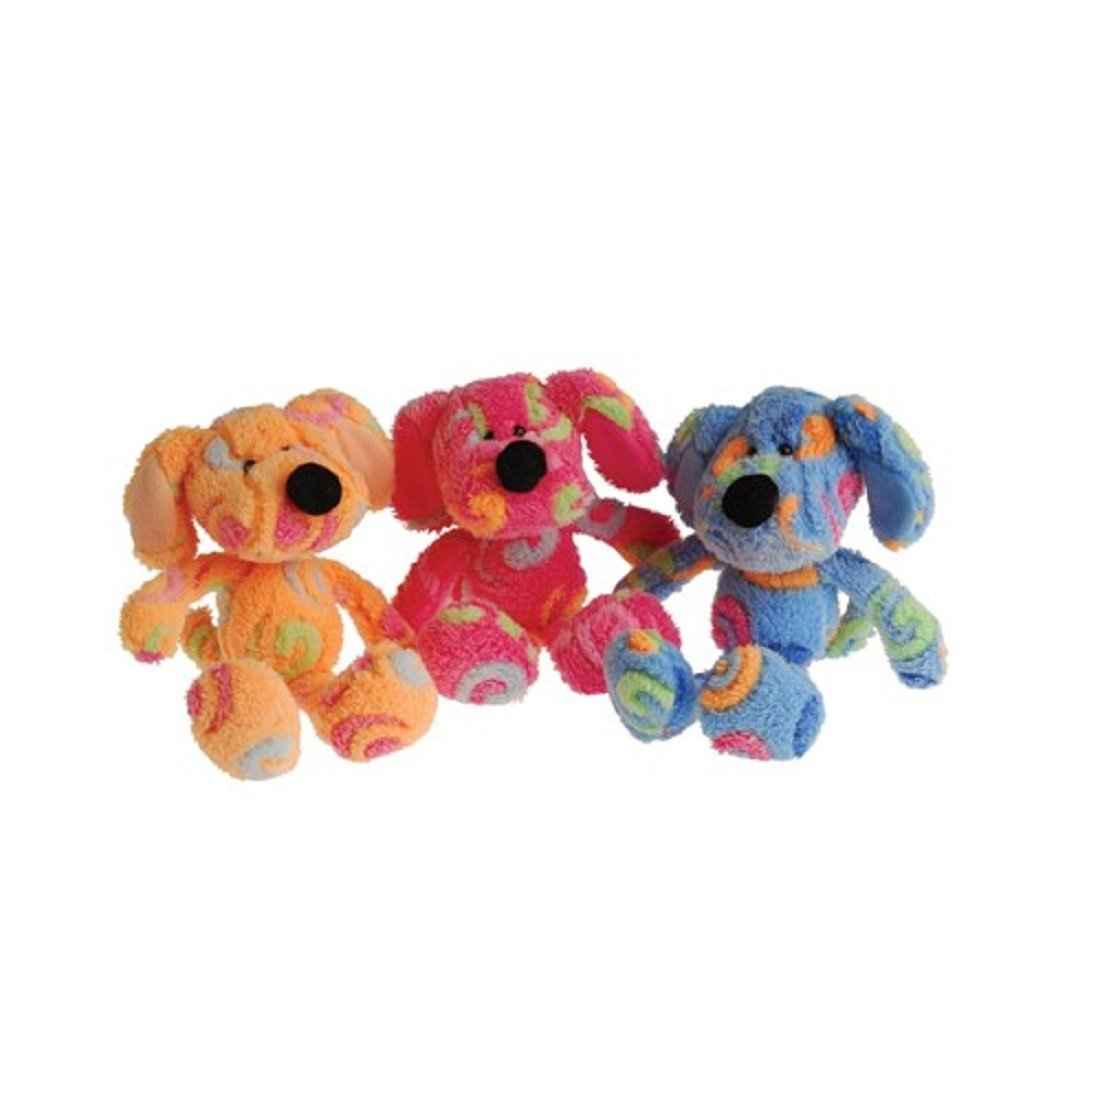 Dozen Assorted Sitting Stuffed Plush Rainbow Swirl Dog Animal Toys